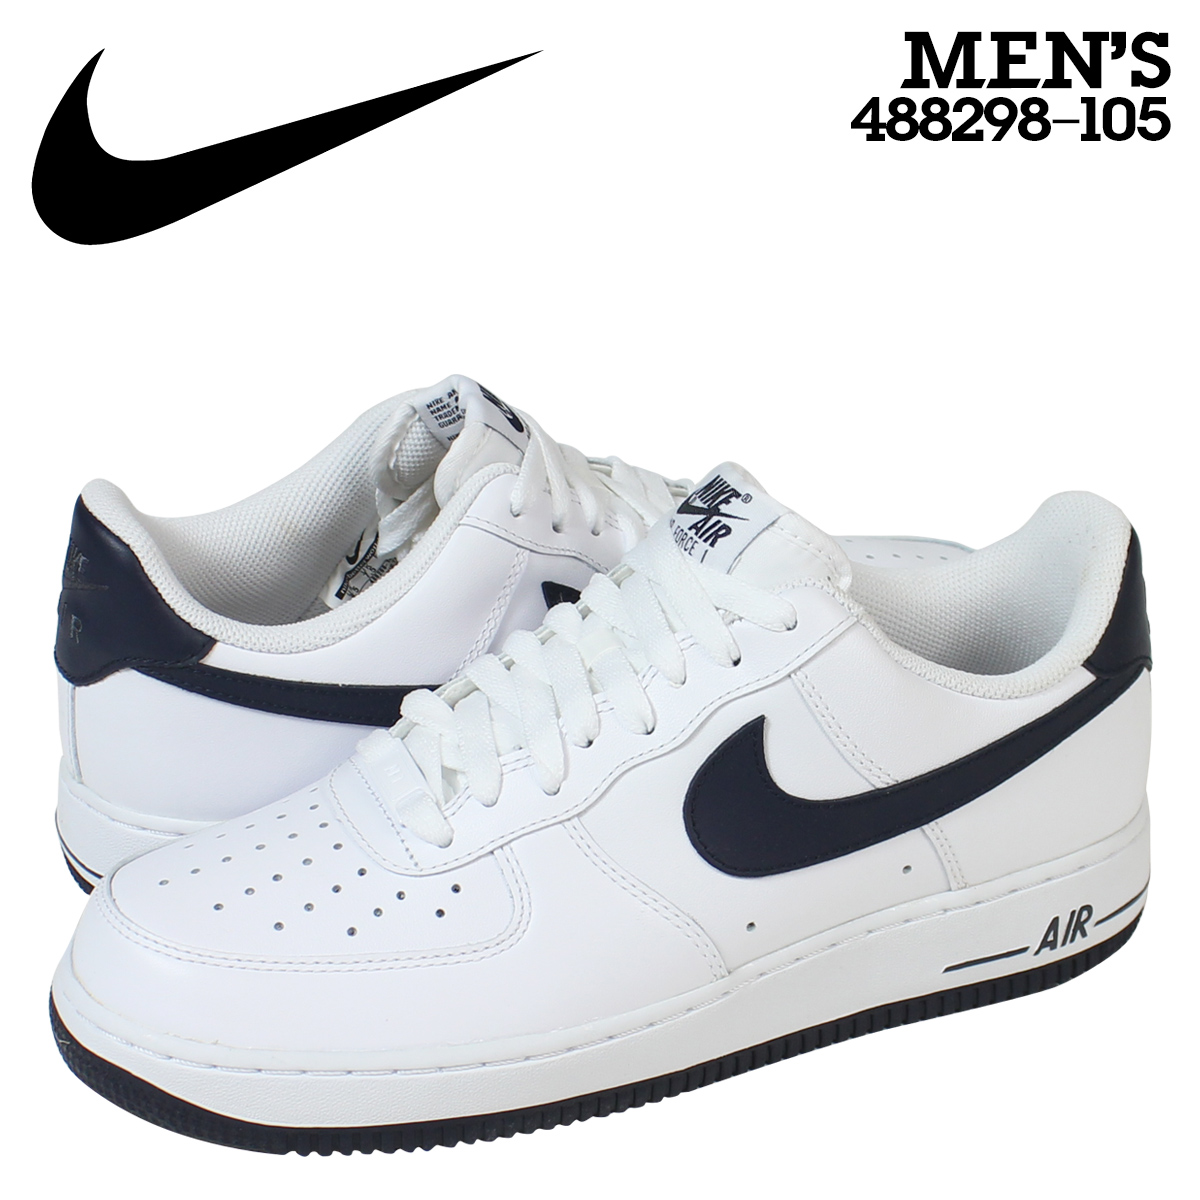 nike shoes online greece